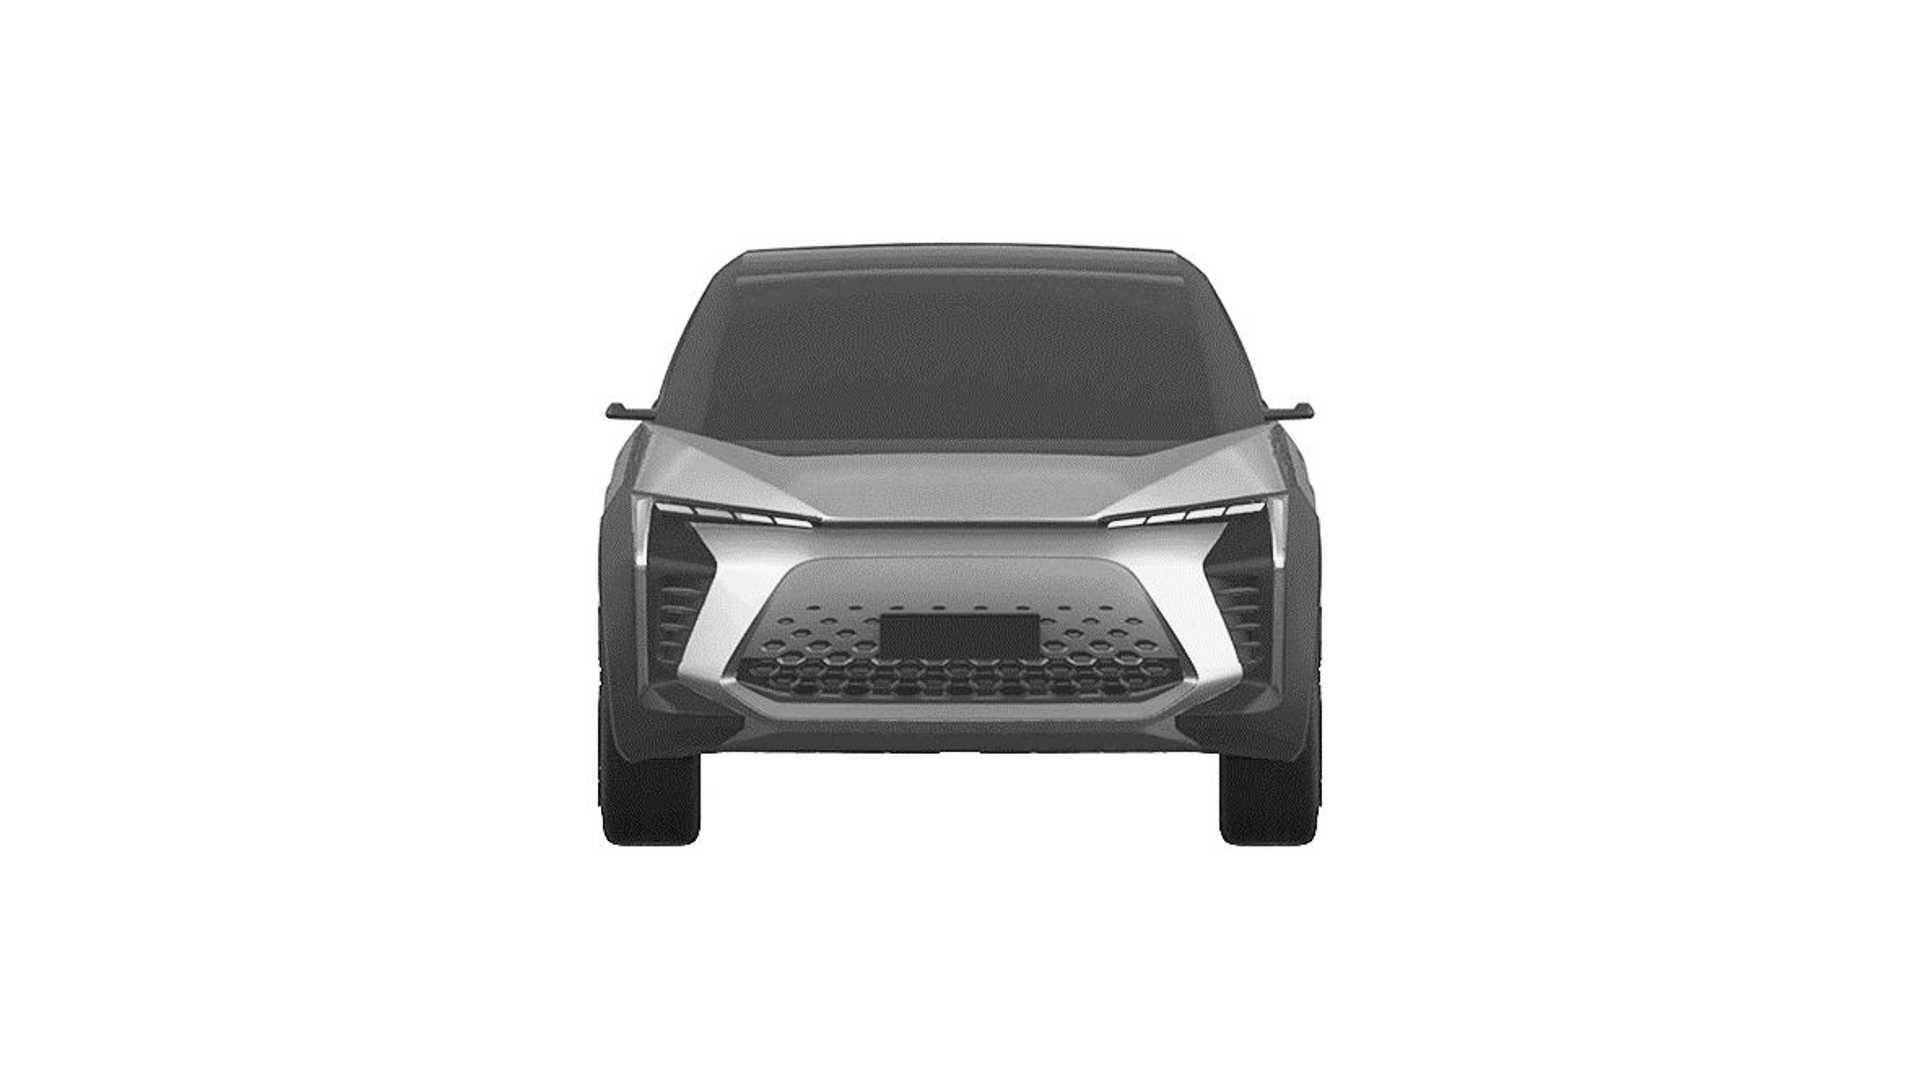 Toyota-Crossover-Design-Trademark-patents-4